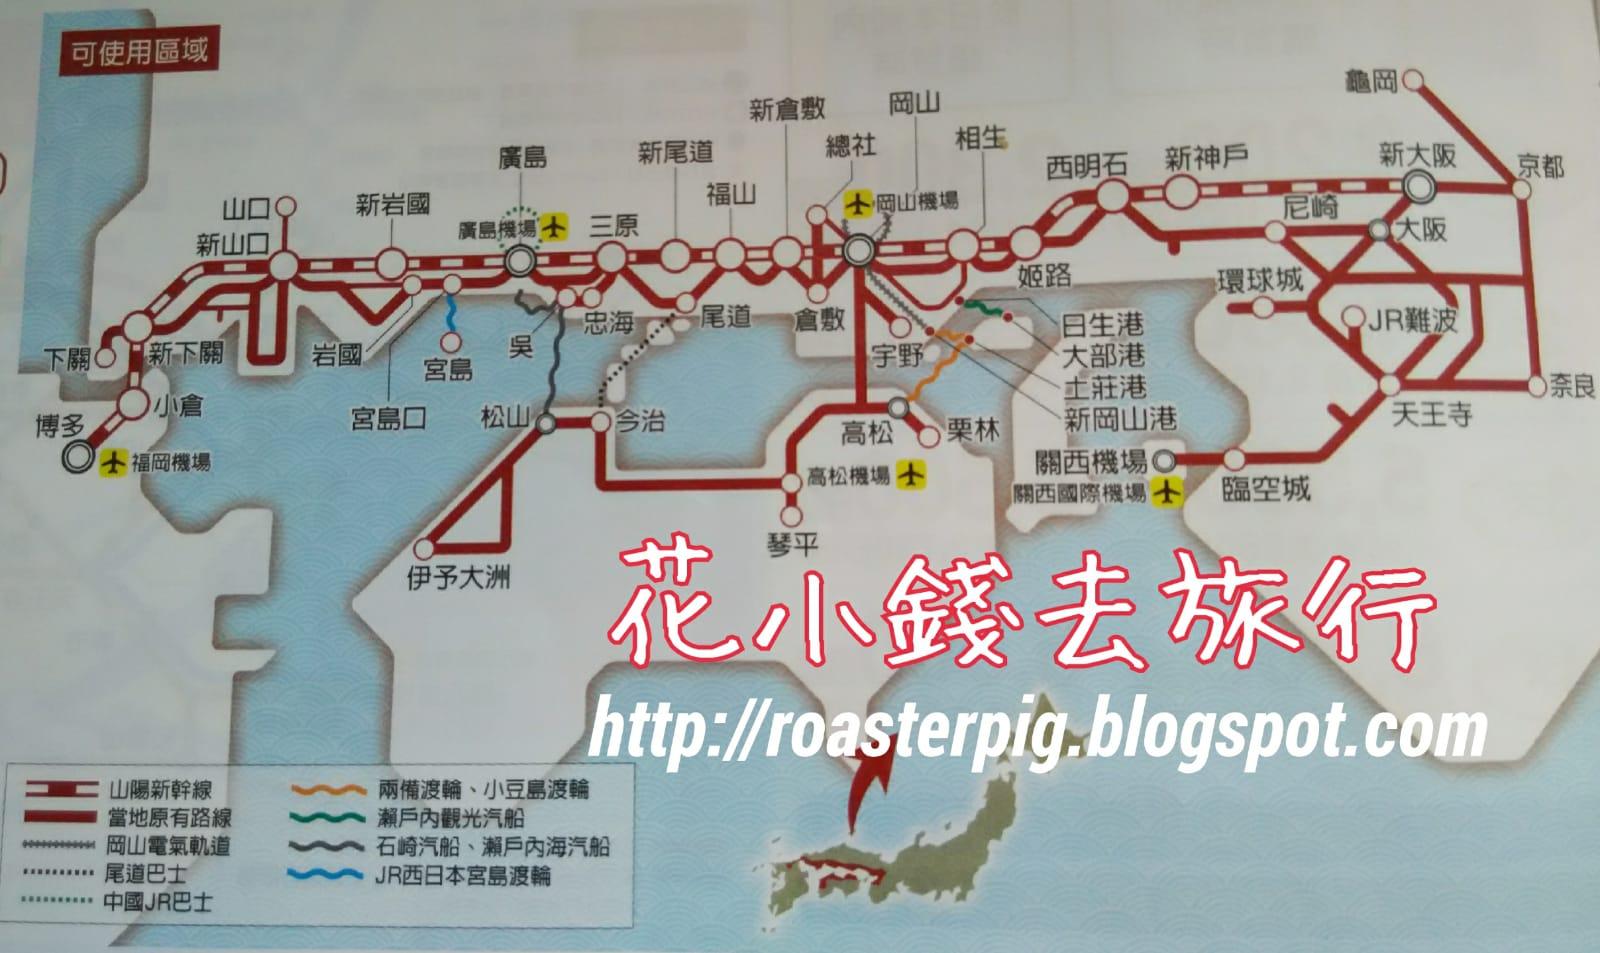 Jr西遊紀行pass路線圖